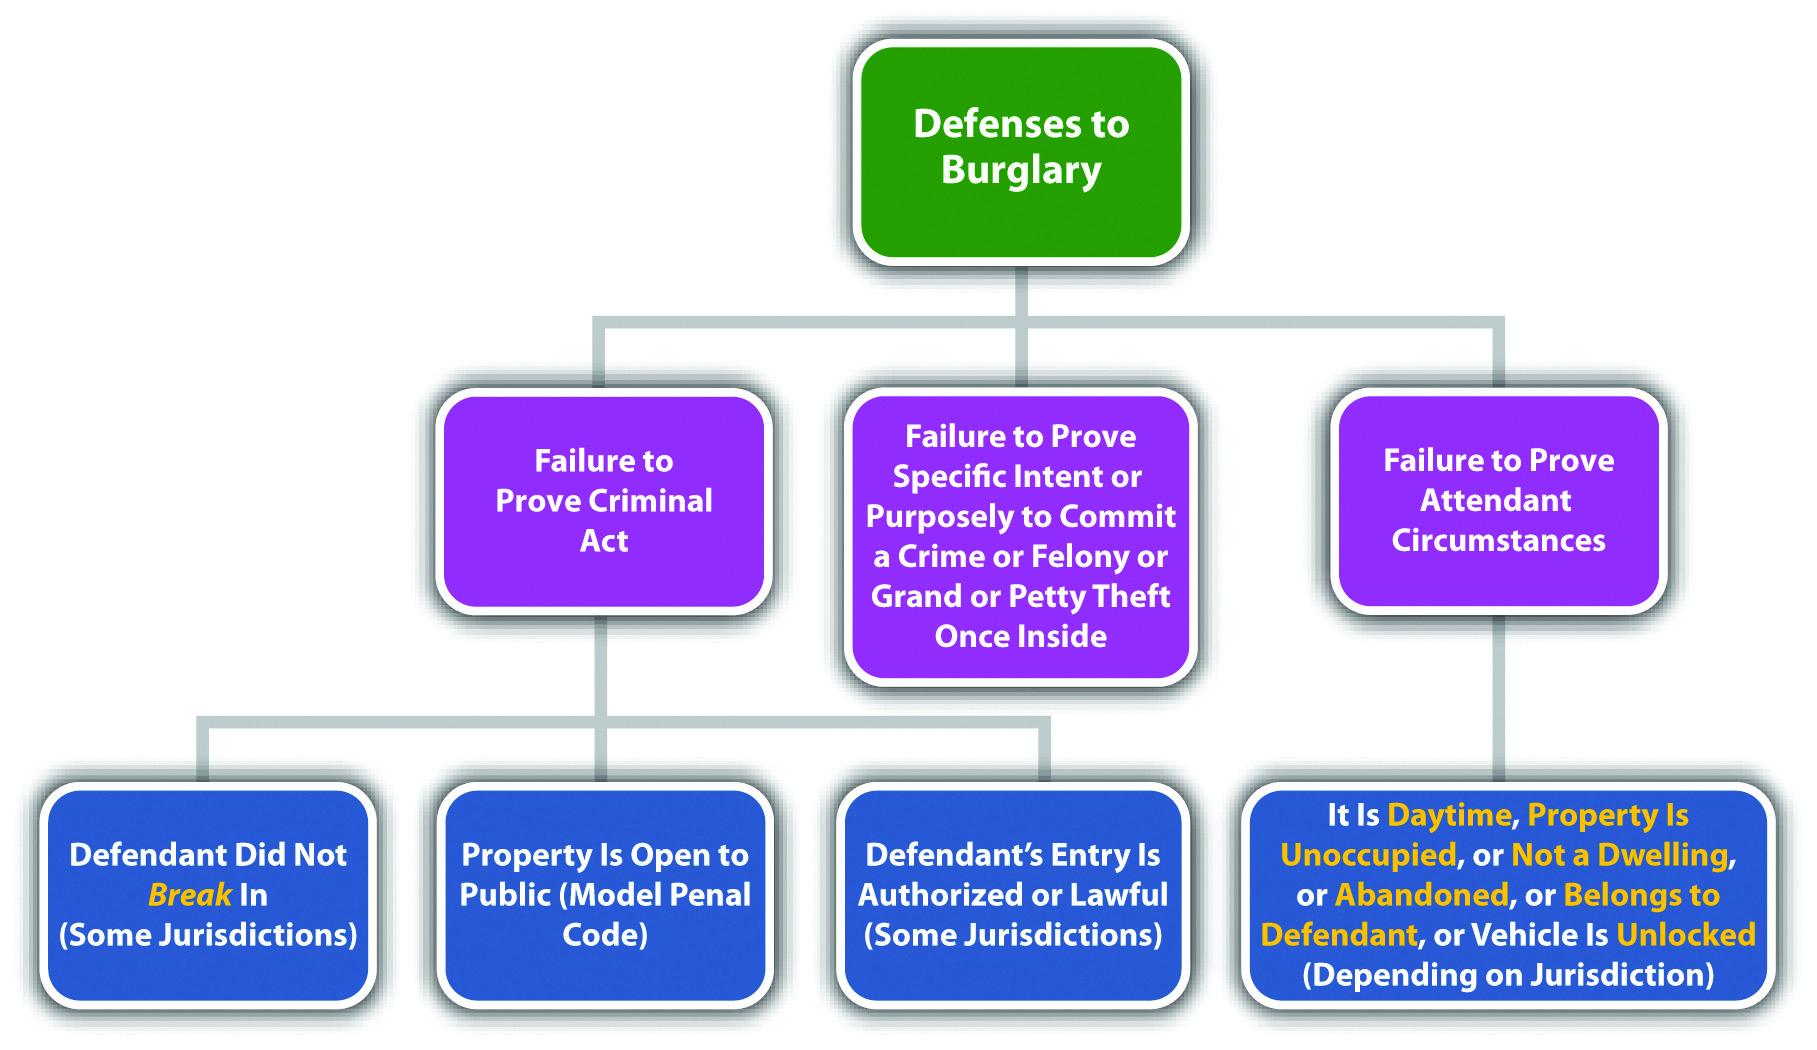 Diagram of Defenses to Burglary